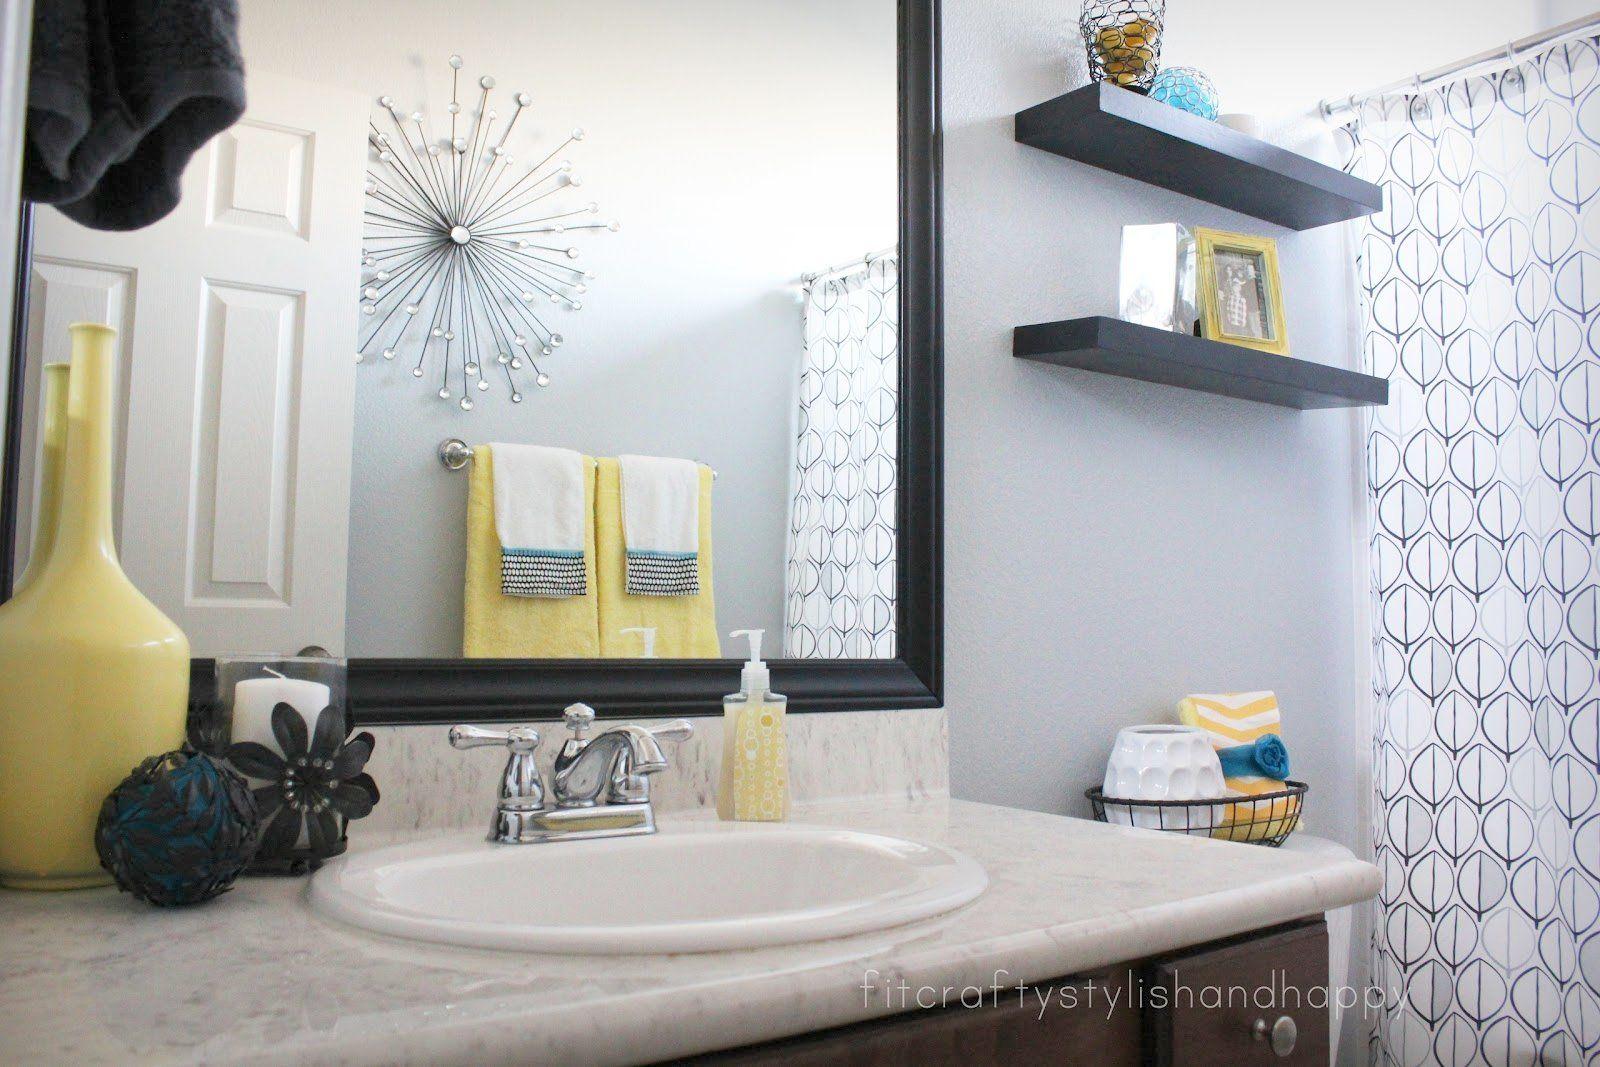 BATHROOM DECOR YELLOW - Google Search  Yellow bathroom decor